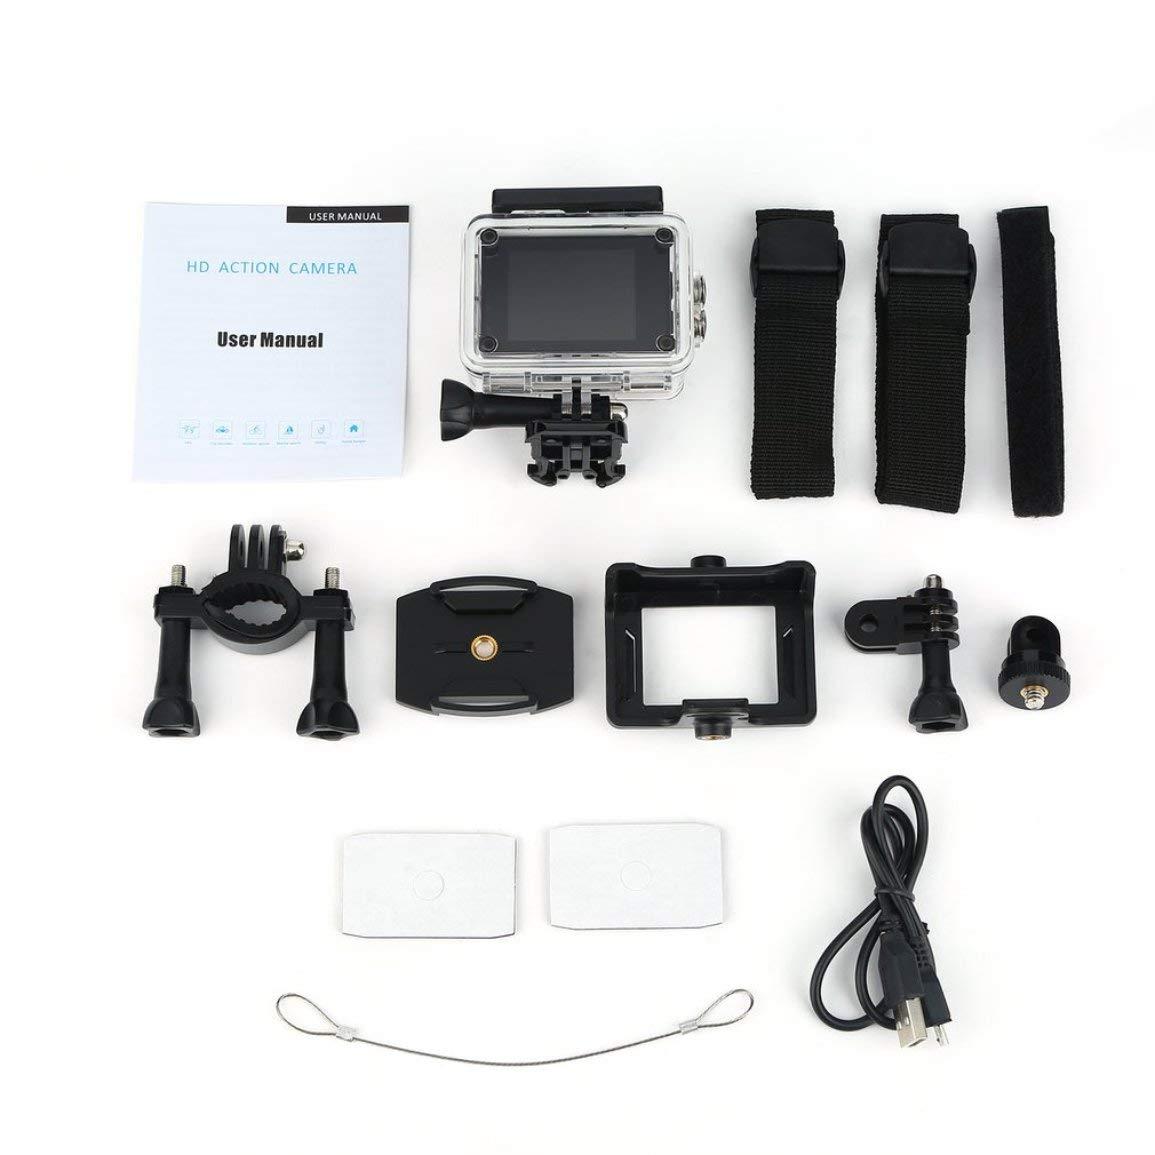 SJ5000 acción de la cámara Deportes CAM Full HD 1080P Impermeable 30m Pantalla LCD de 2.0 Pulgadas Cámara Mini DV Deportes con CAM Accesorios